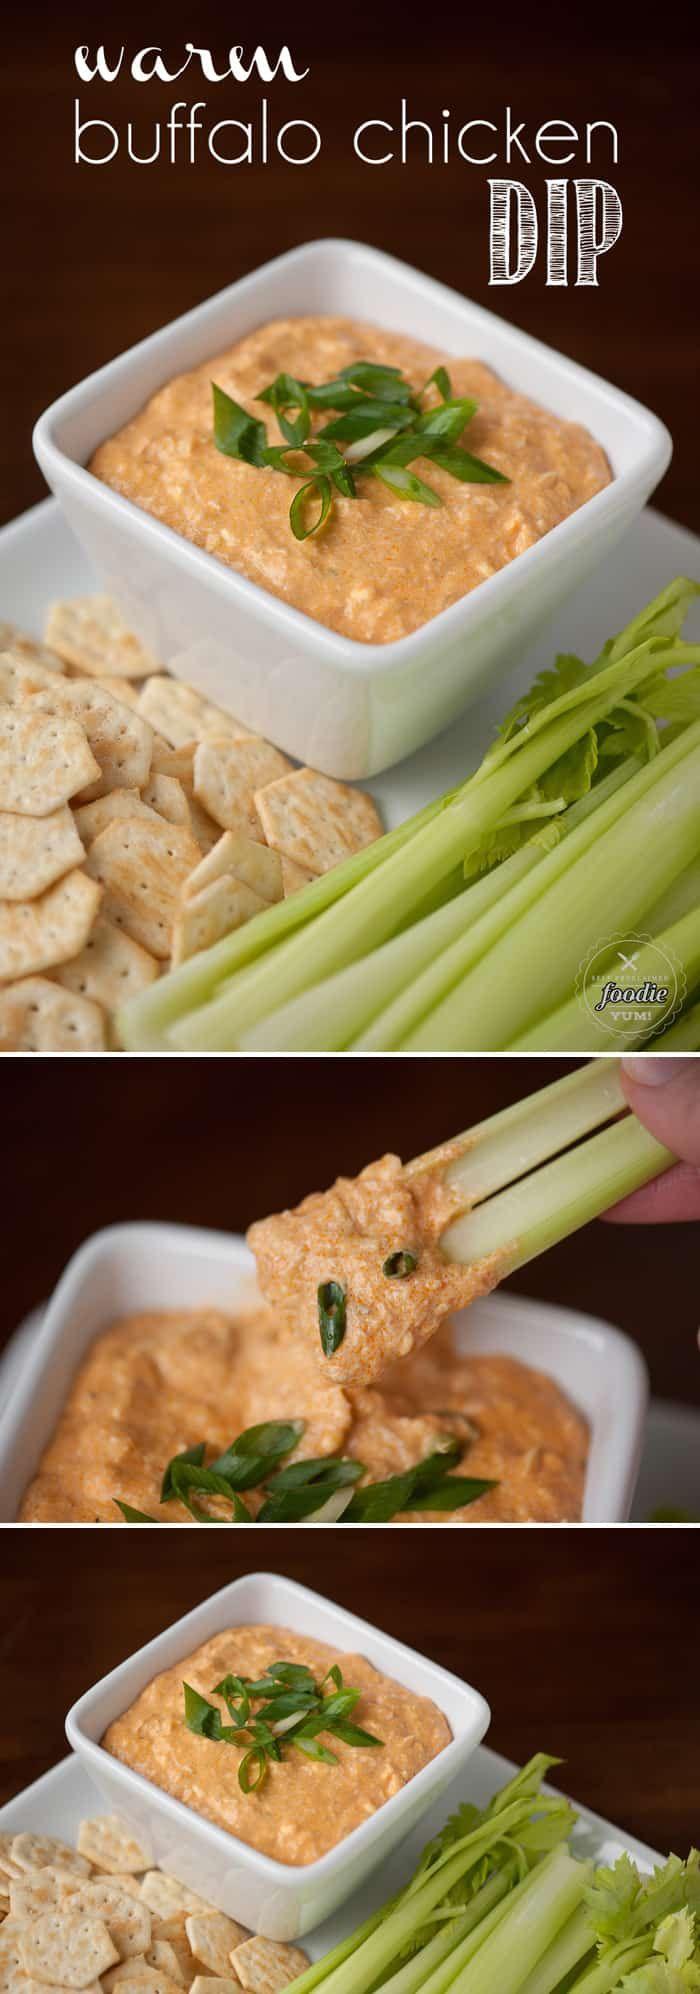 {The BEST} Warm Buffalo Chicken Dip Recipe | Self Proclaimed Foodie